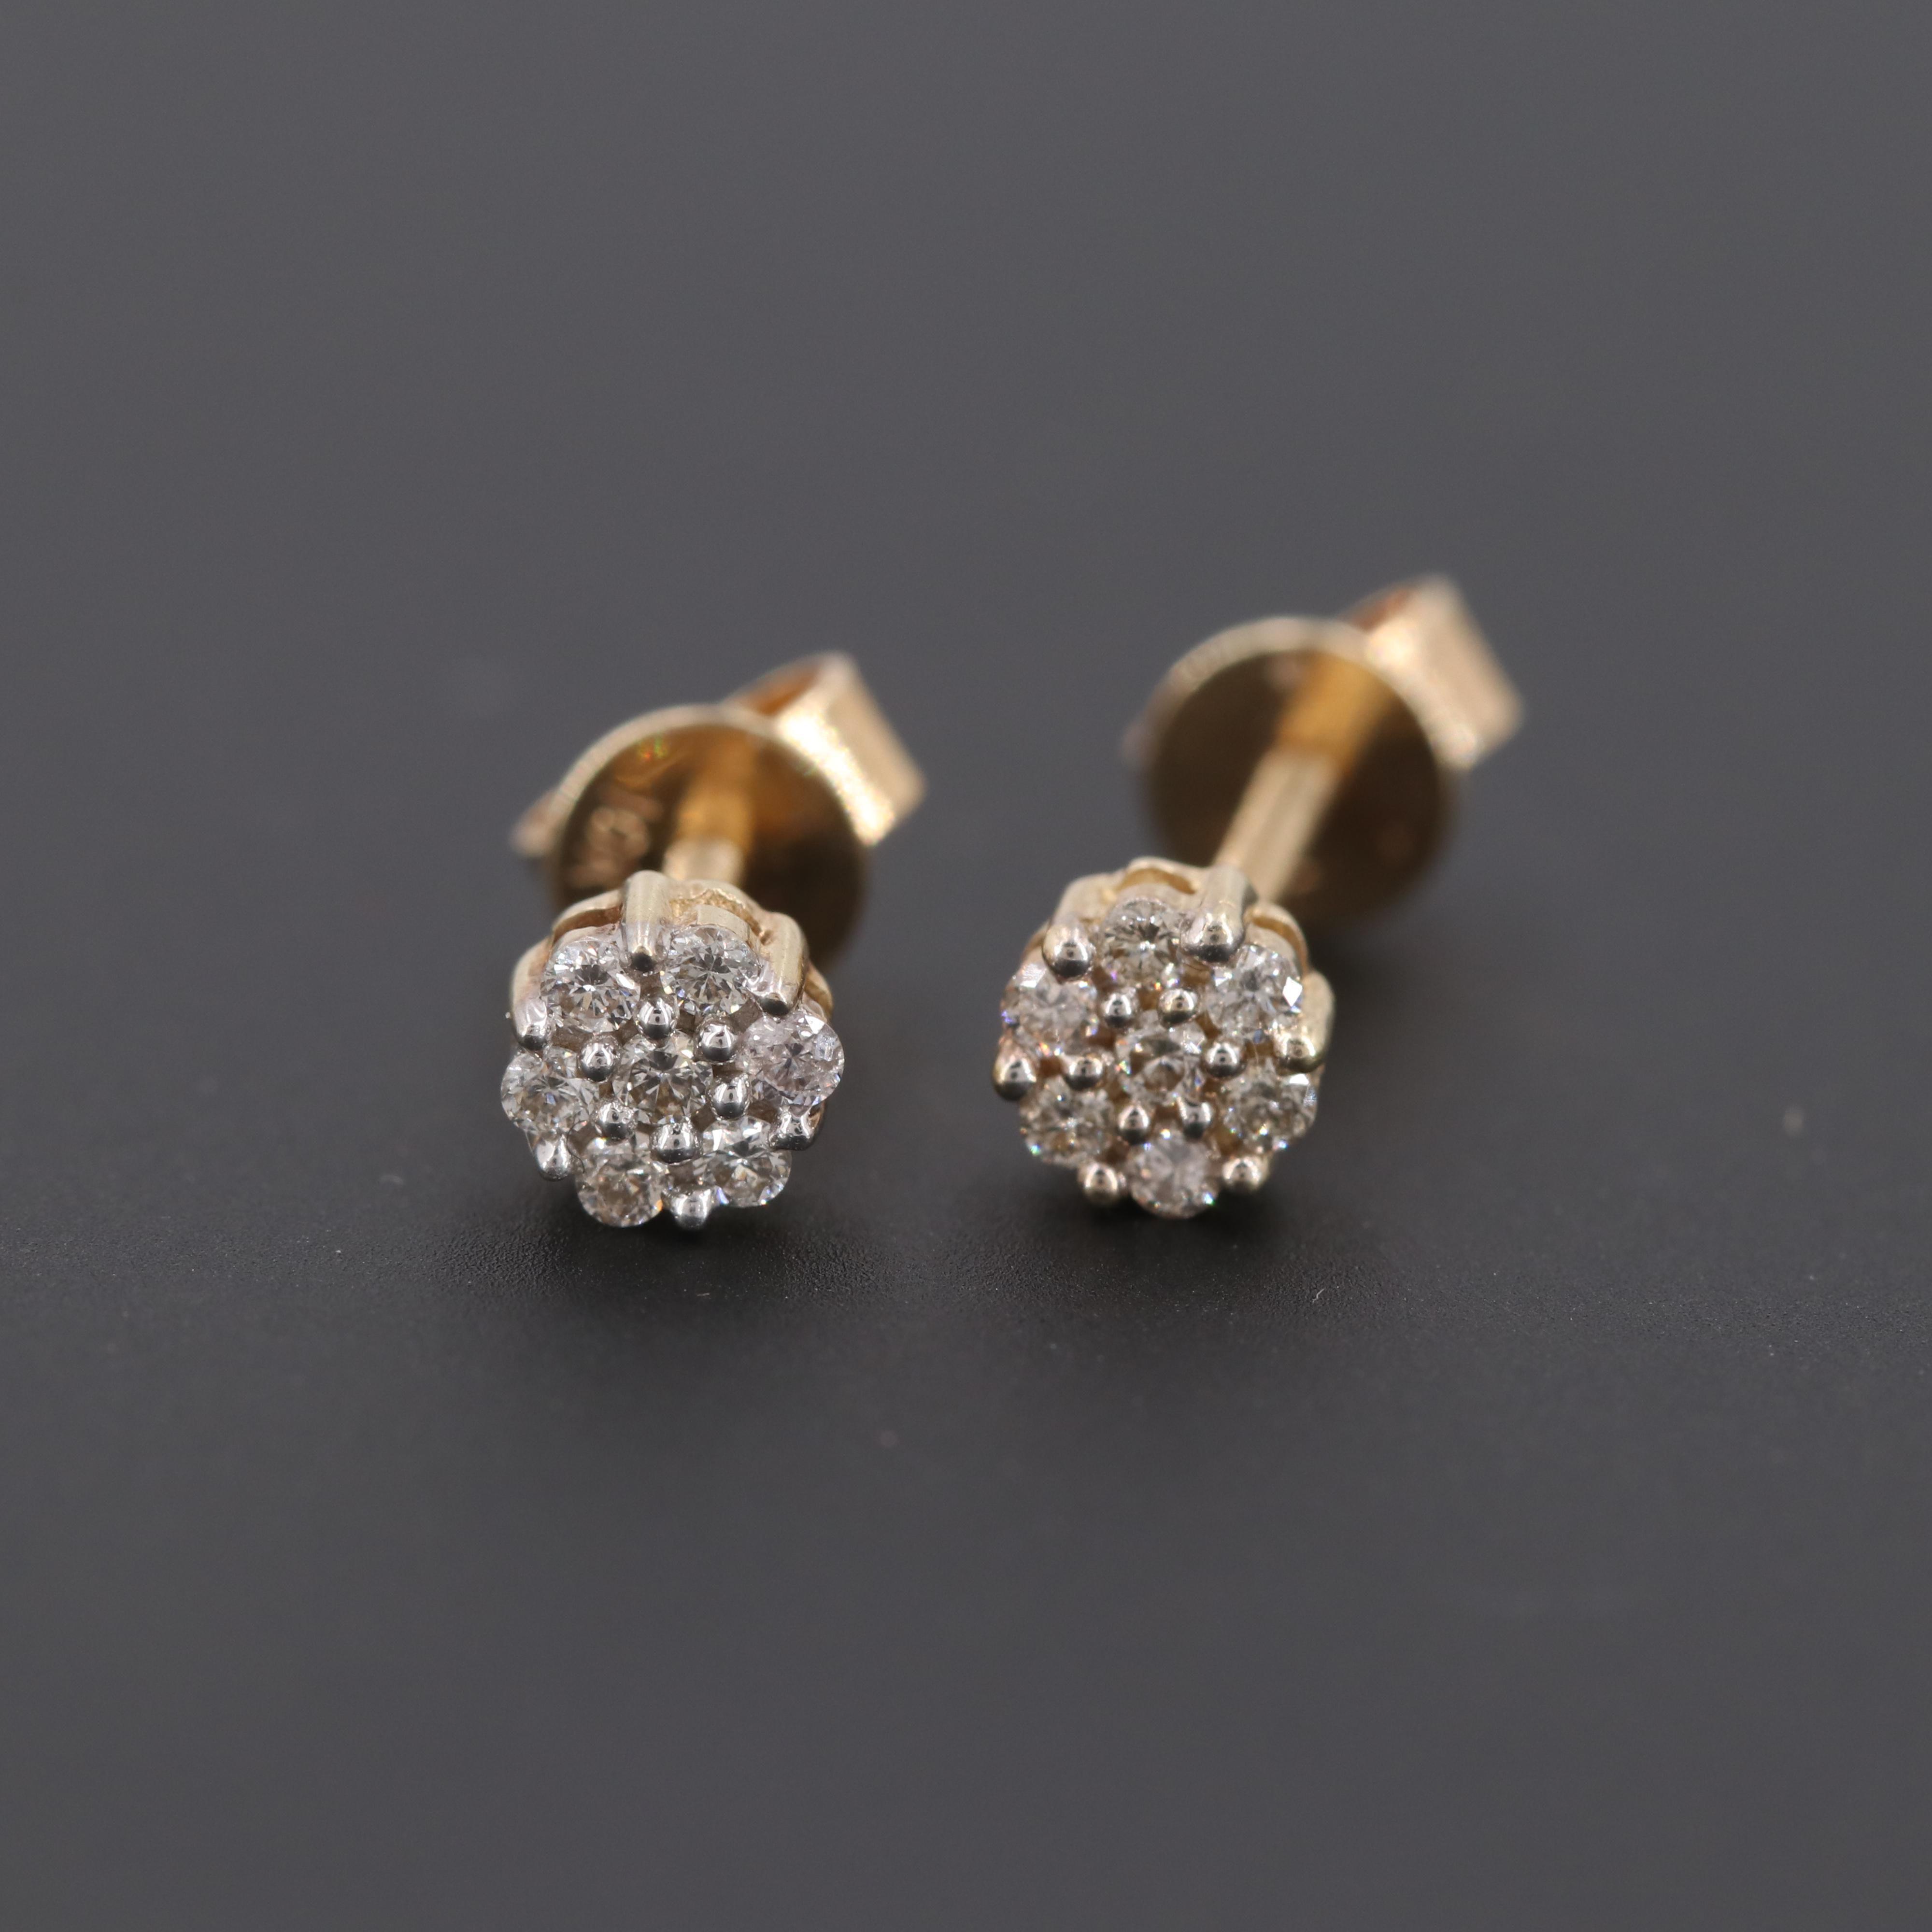 10K Yellow Gold Diamond Cluster Stud Earrings